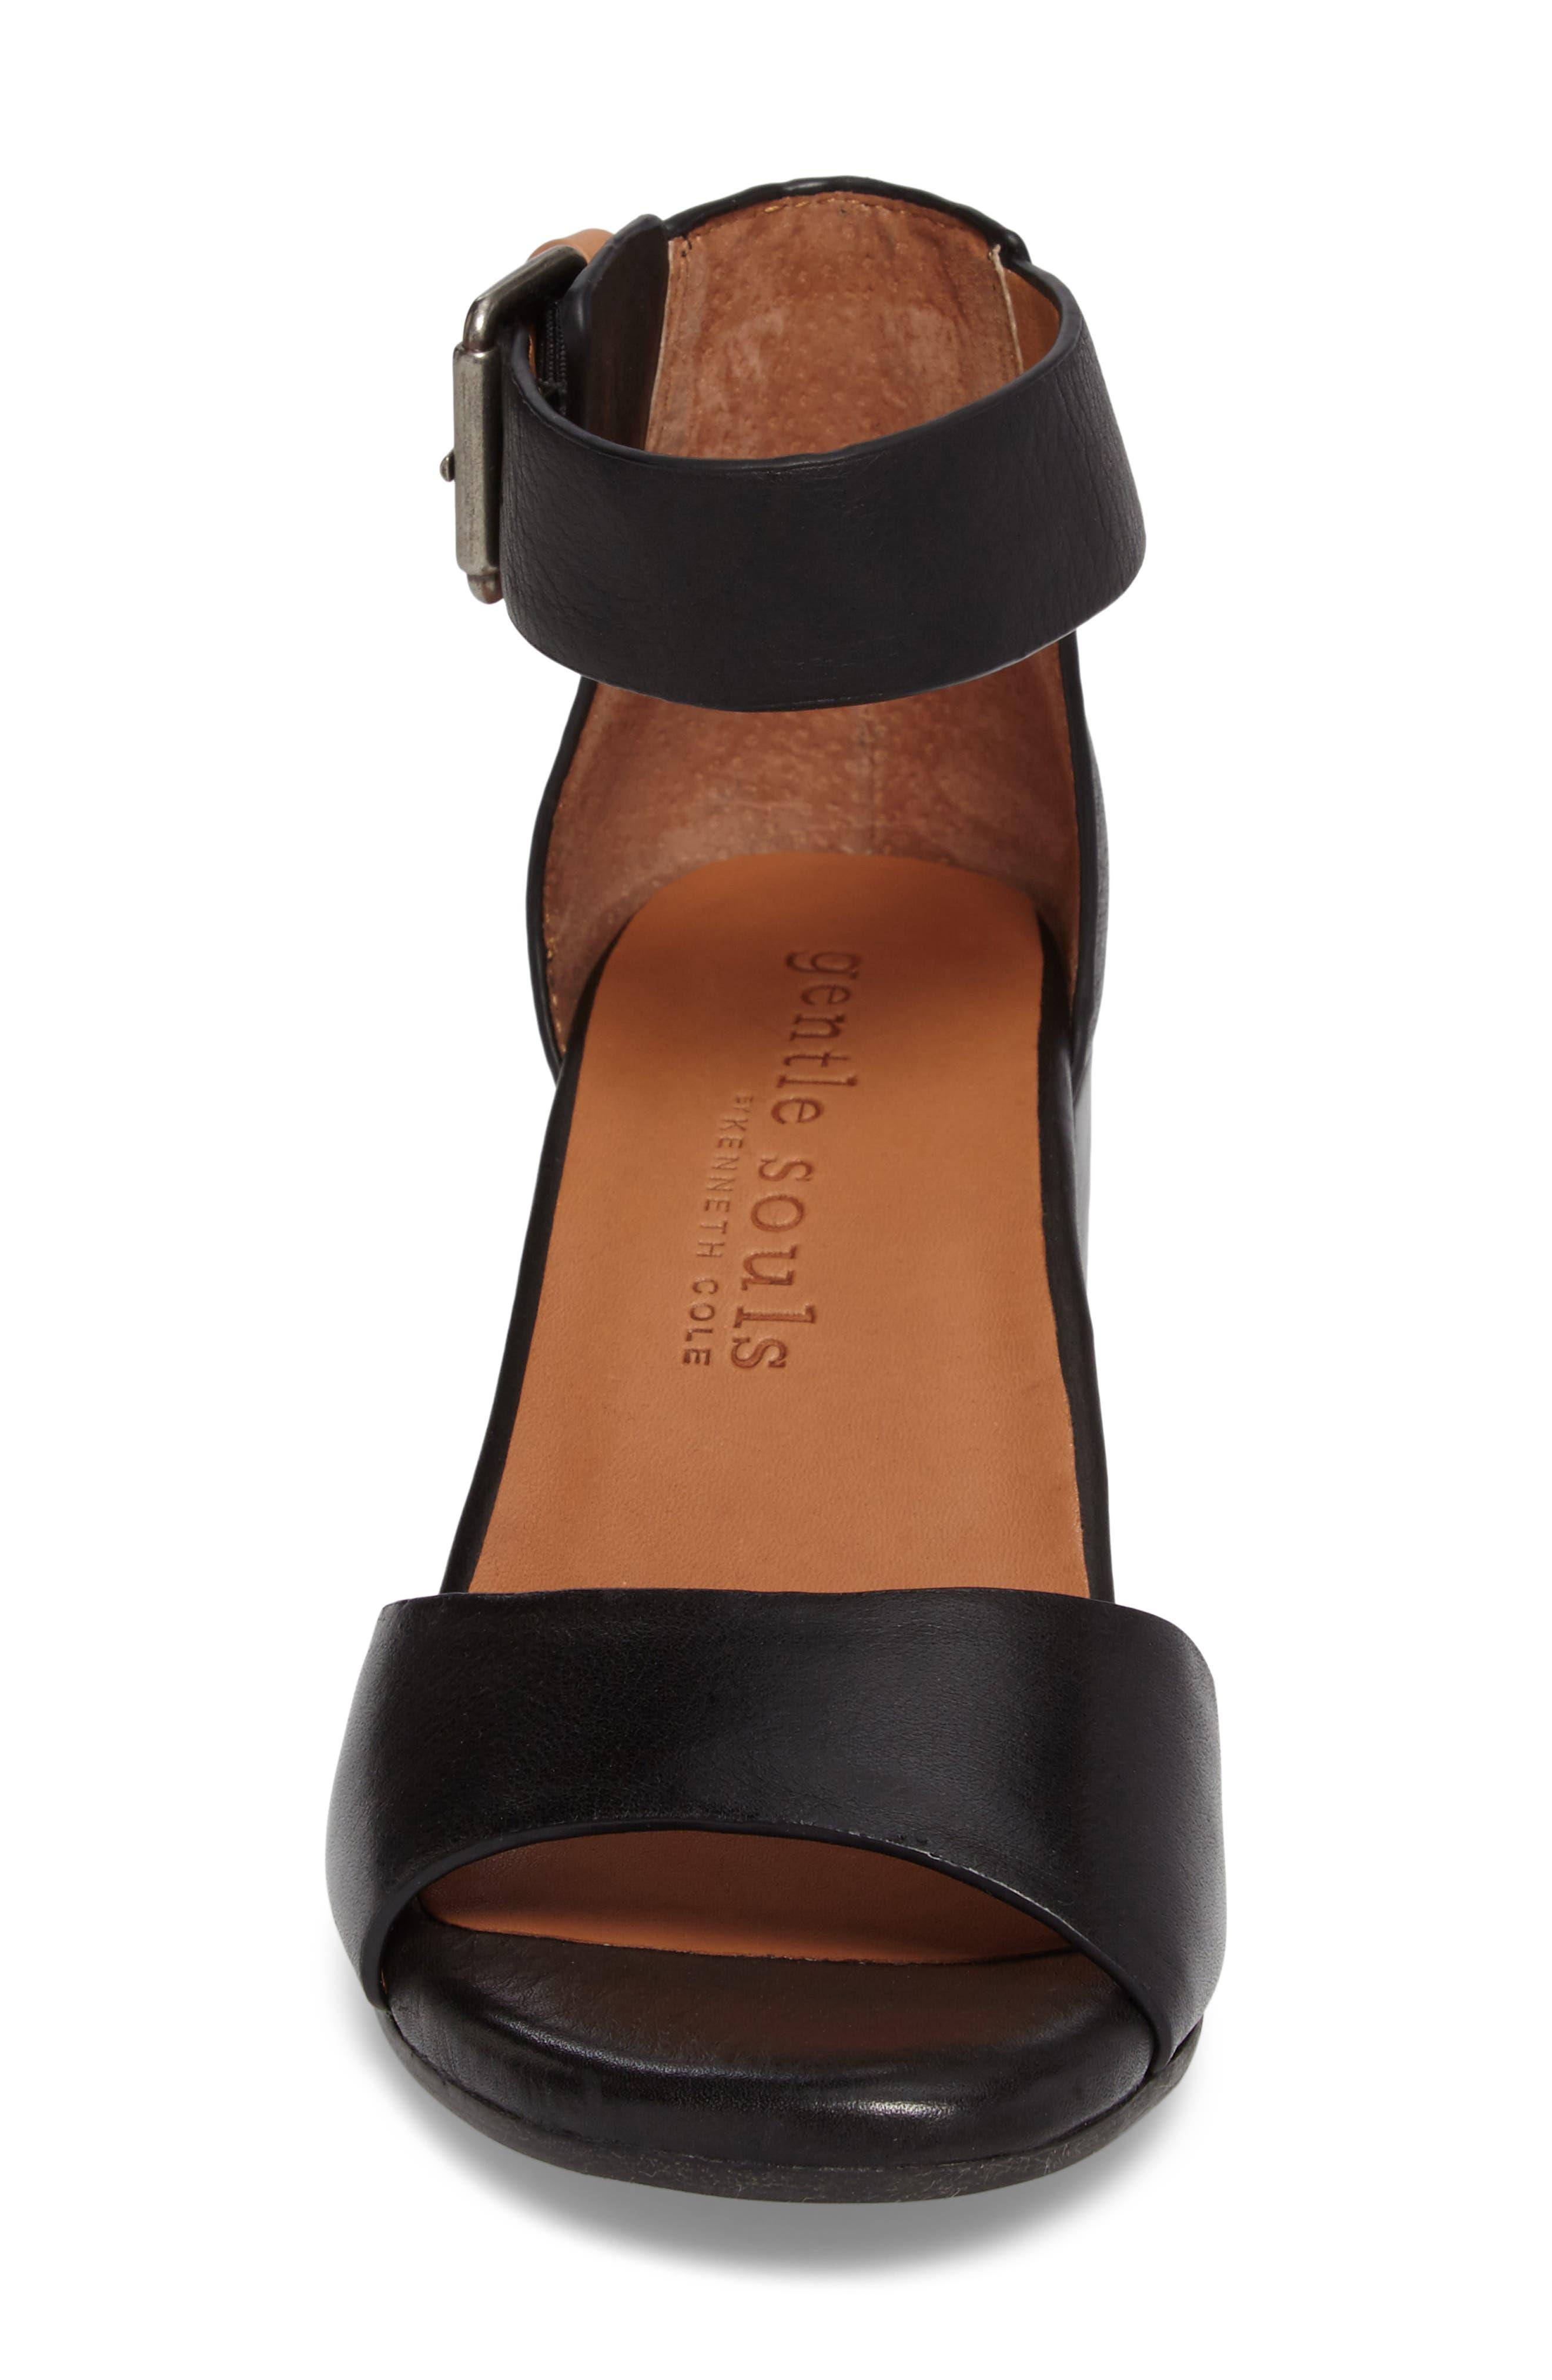 GENTLE SOULS BY KENNETH COLE, Christa Block Heel Sandal, Alternate thumbnail 4, color, BLACK LEATHER